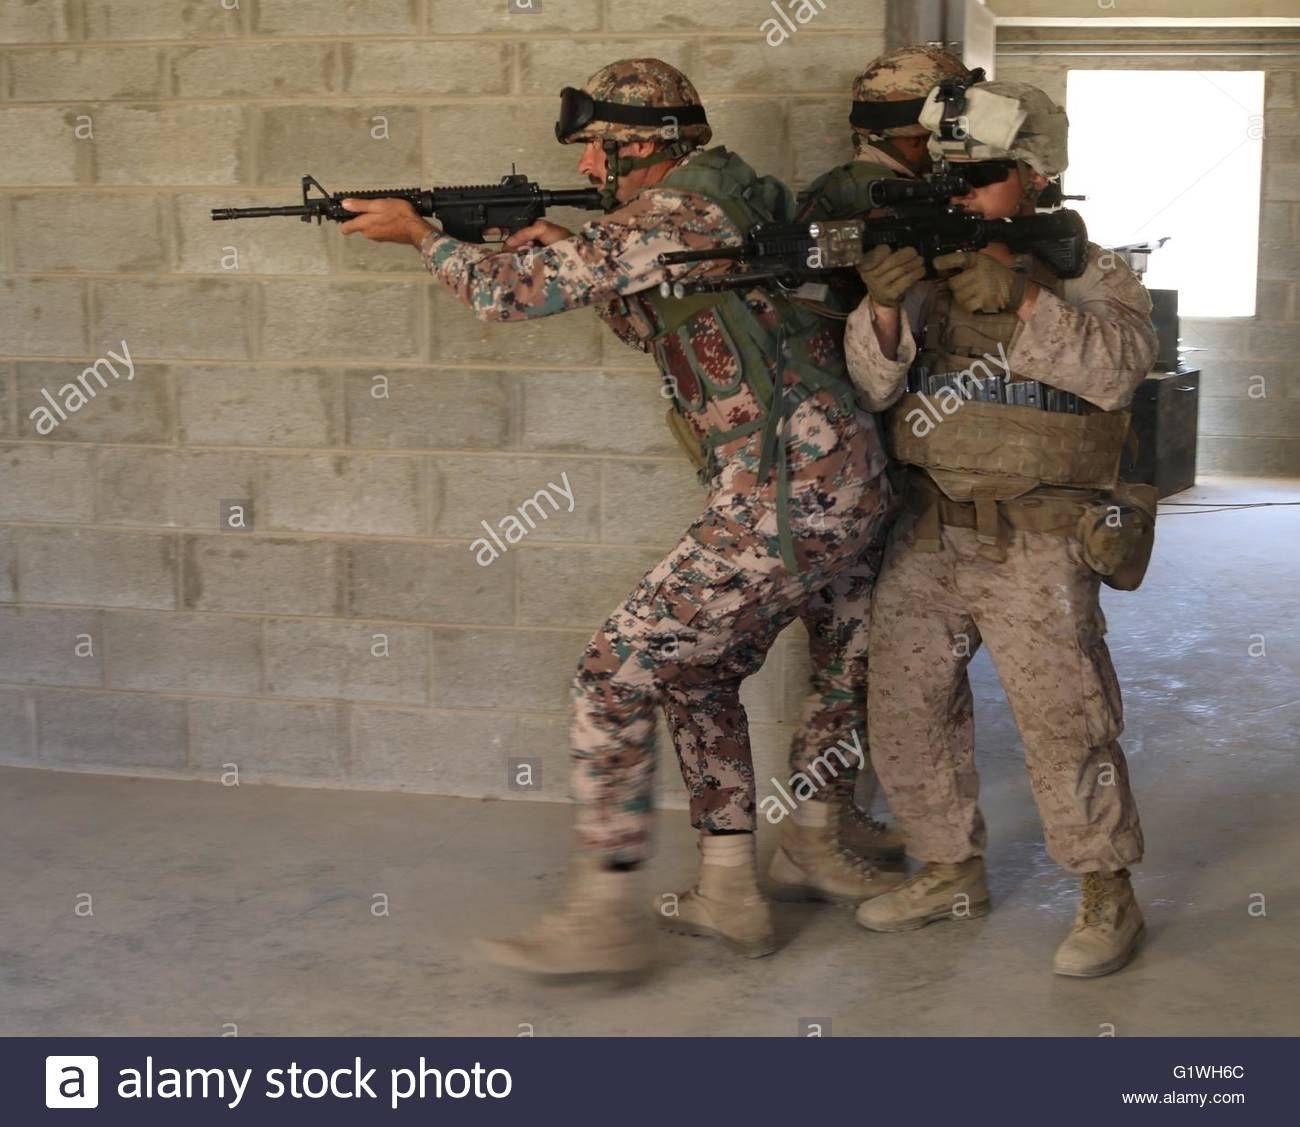 Download this stock image royal jordanian army quick